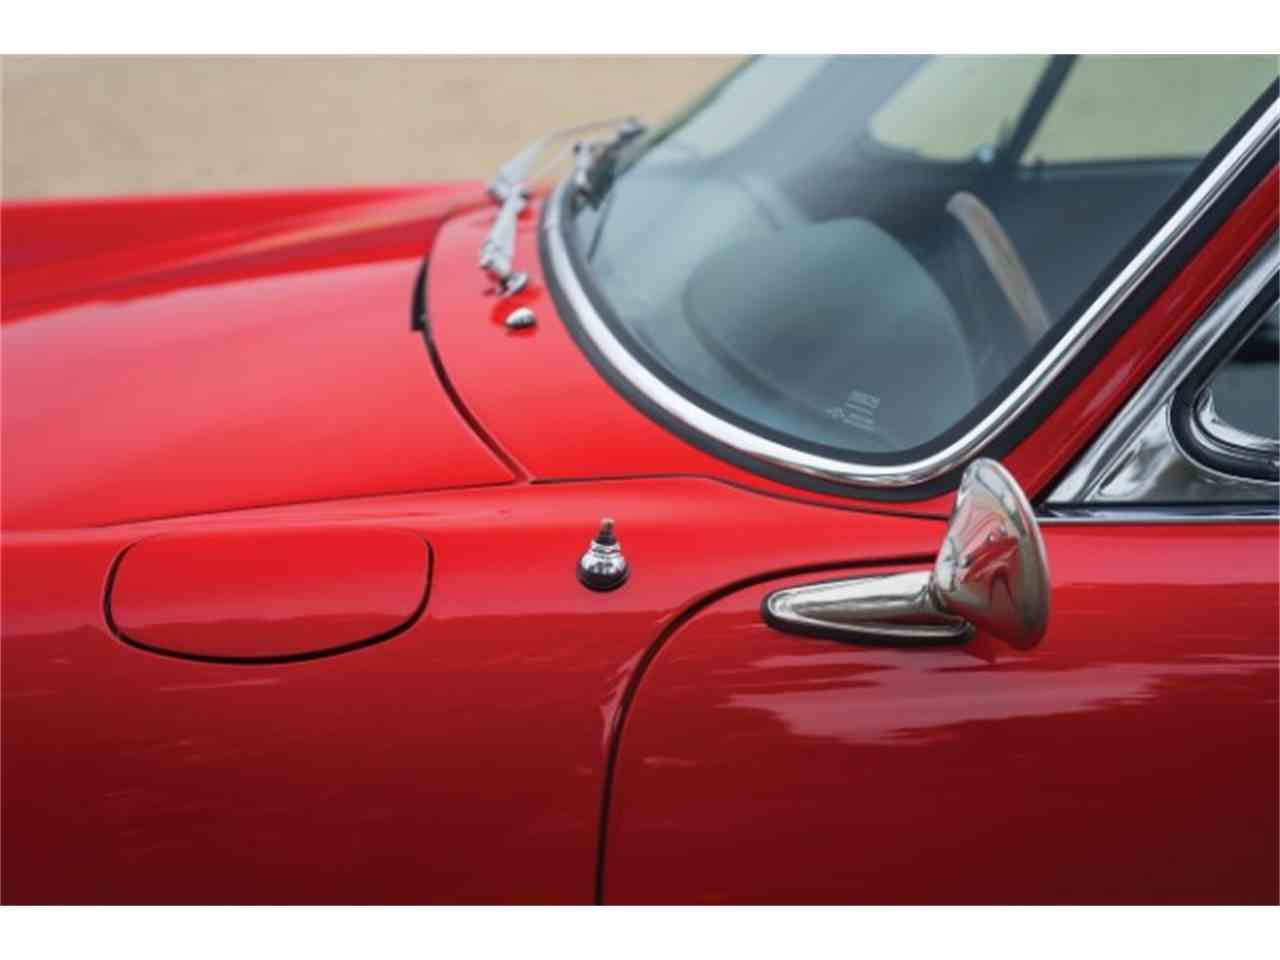 1965 Porsche 911 for Sale | ClassicCars.com | CC-875934